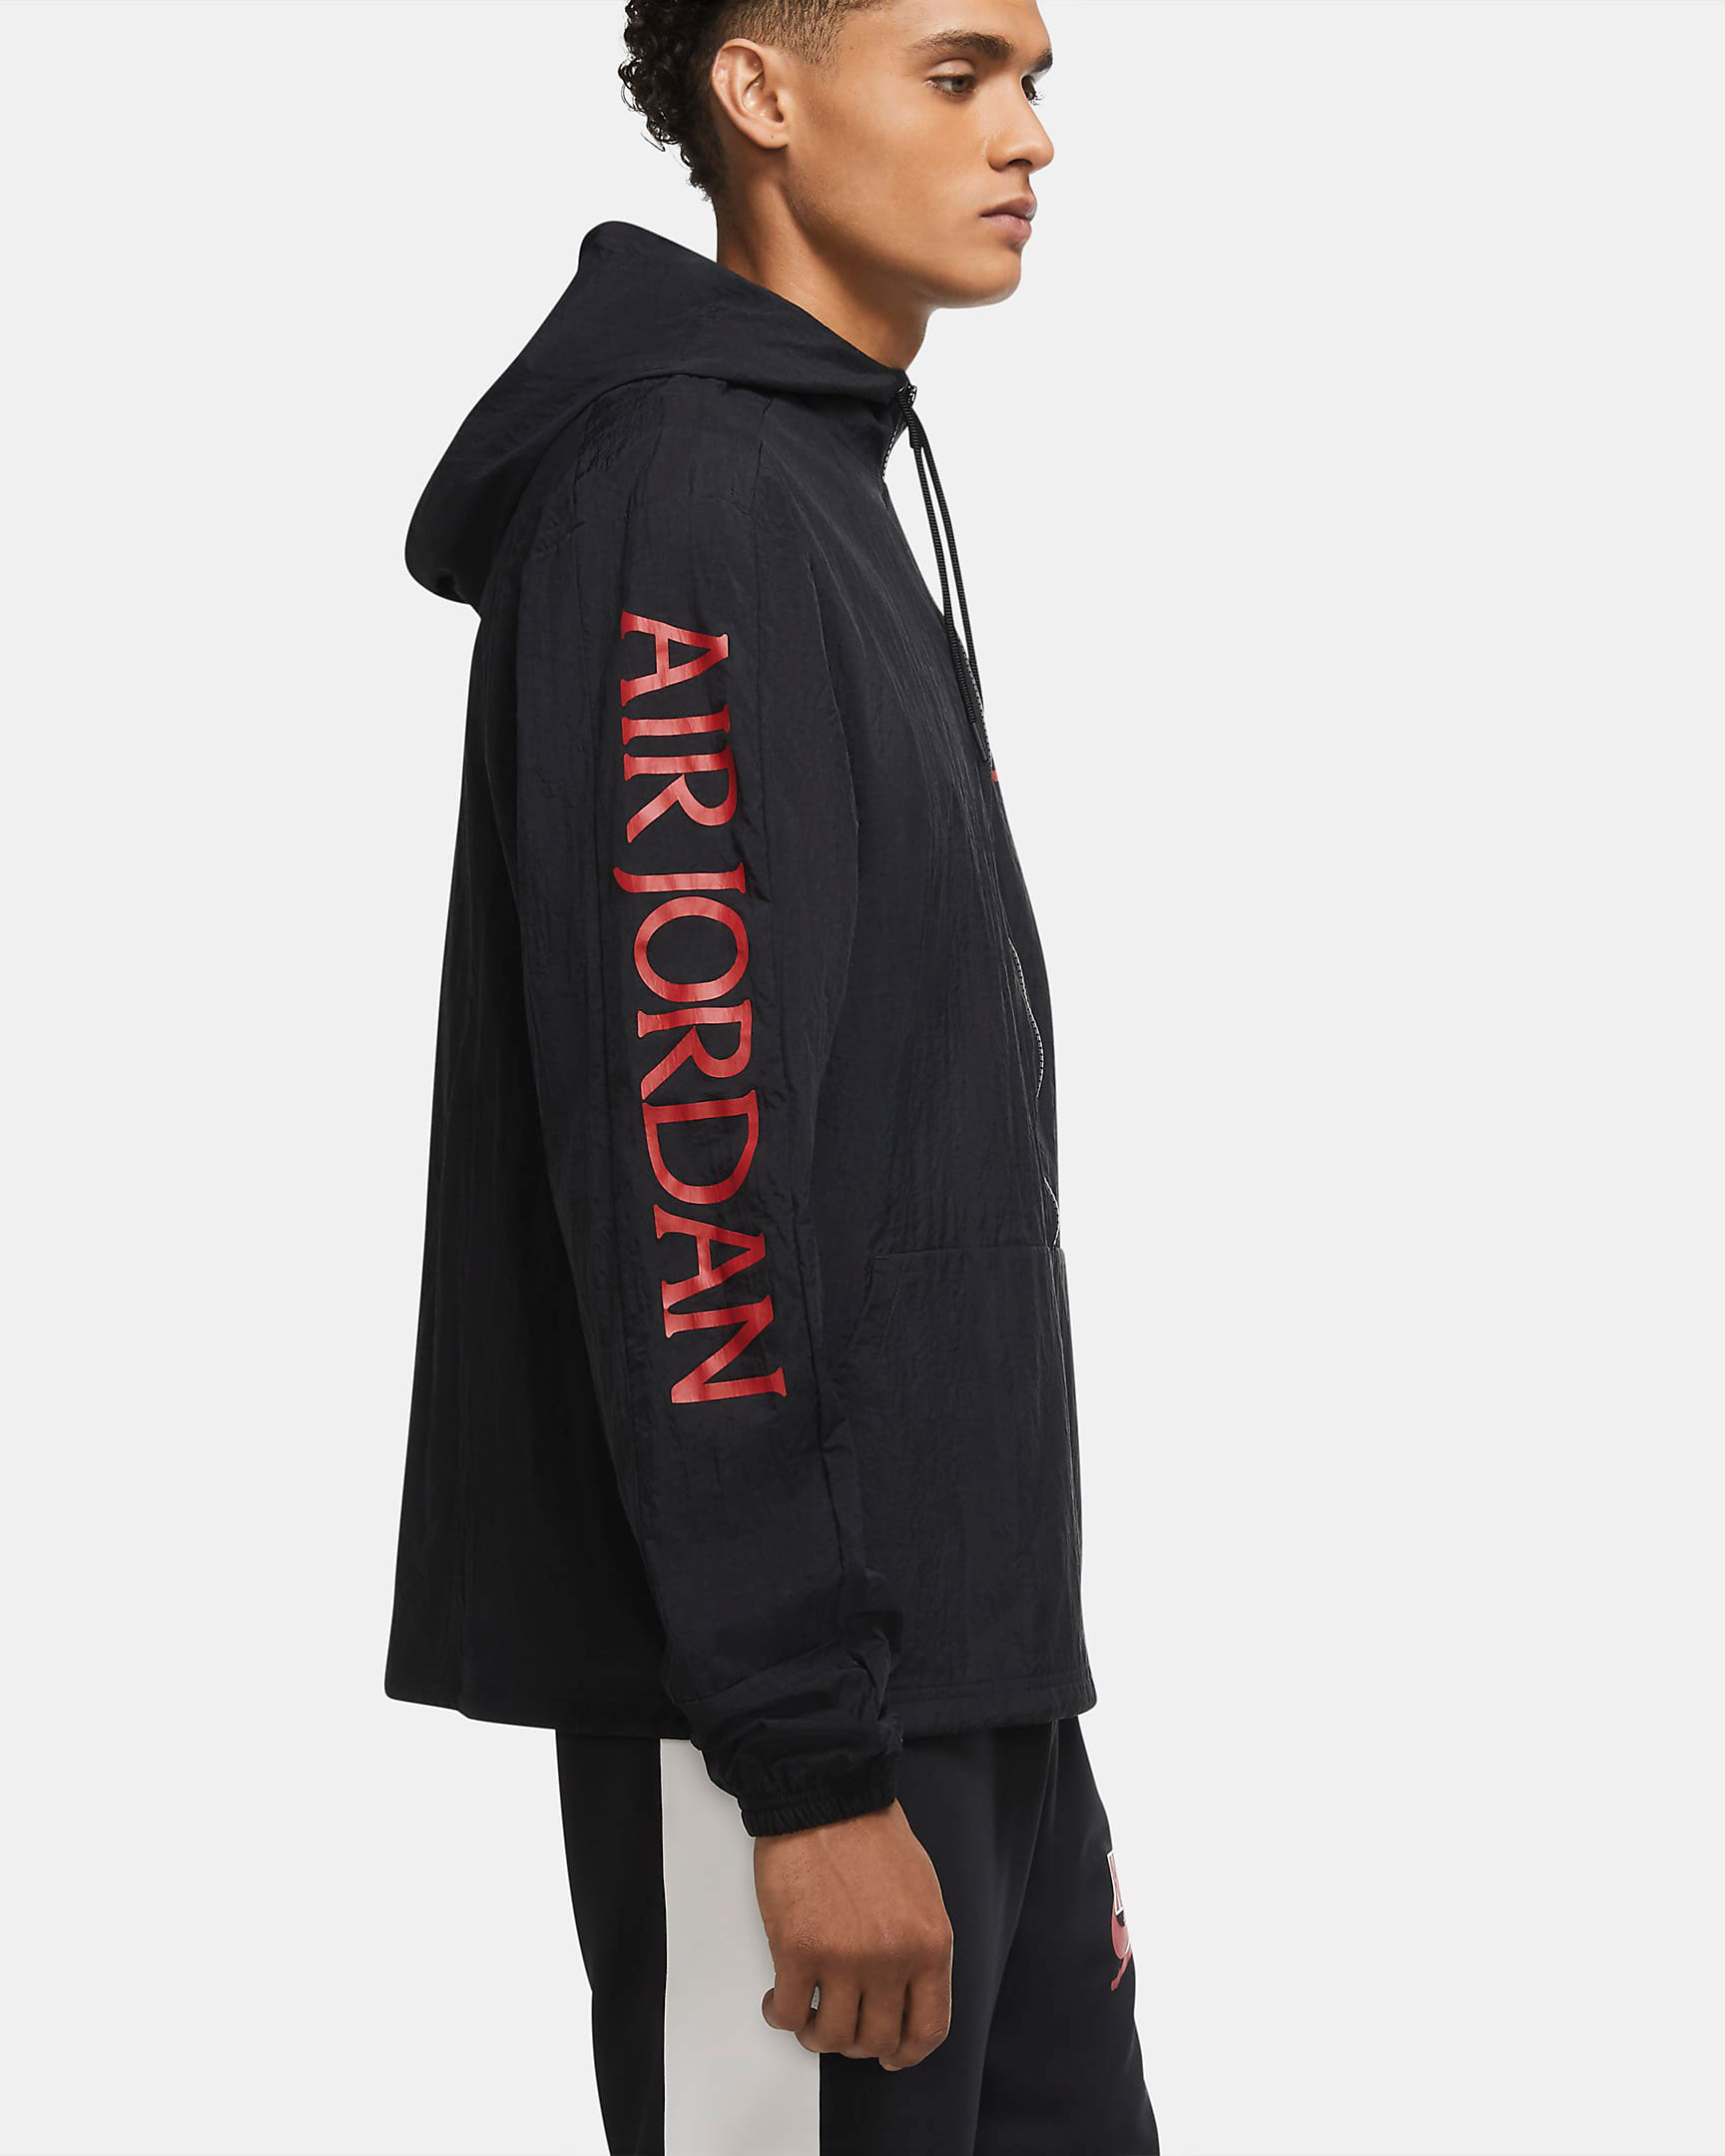 jordan-jumpman-classics-windbreaker-jacket-black-red-3